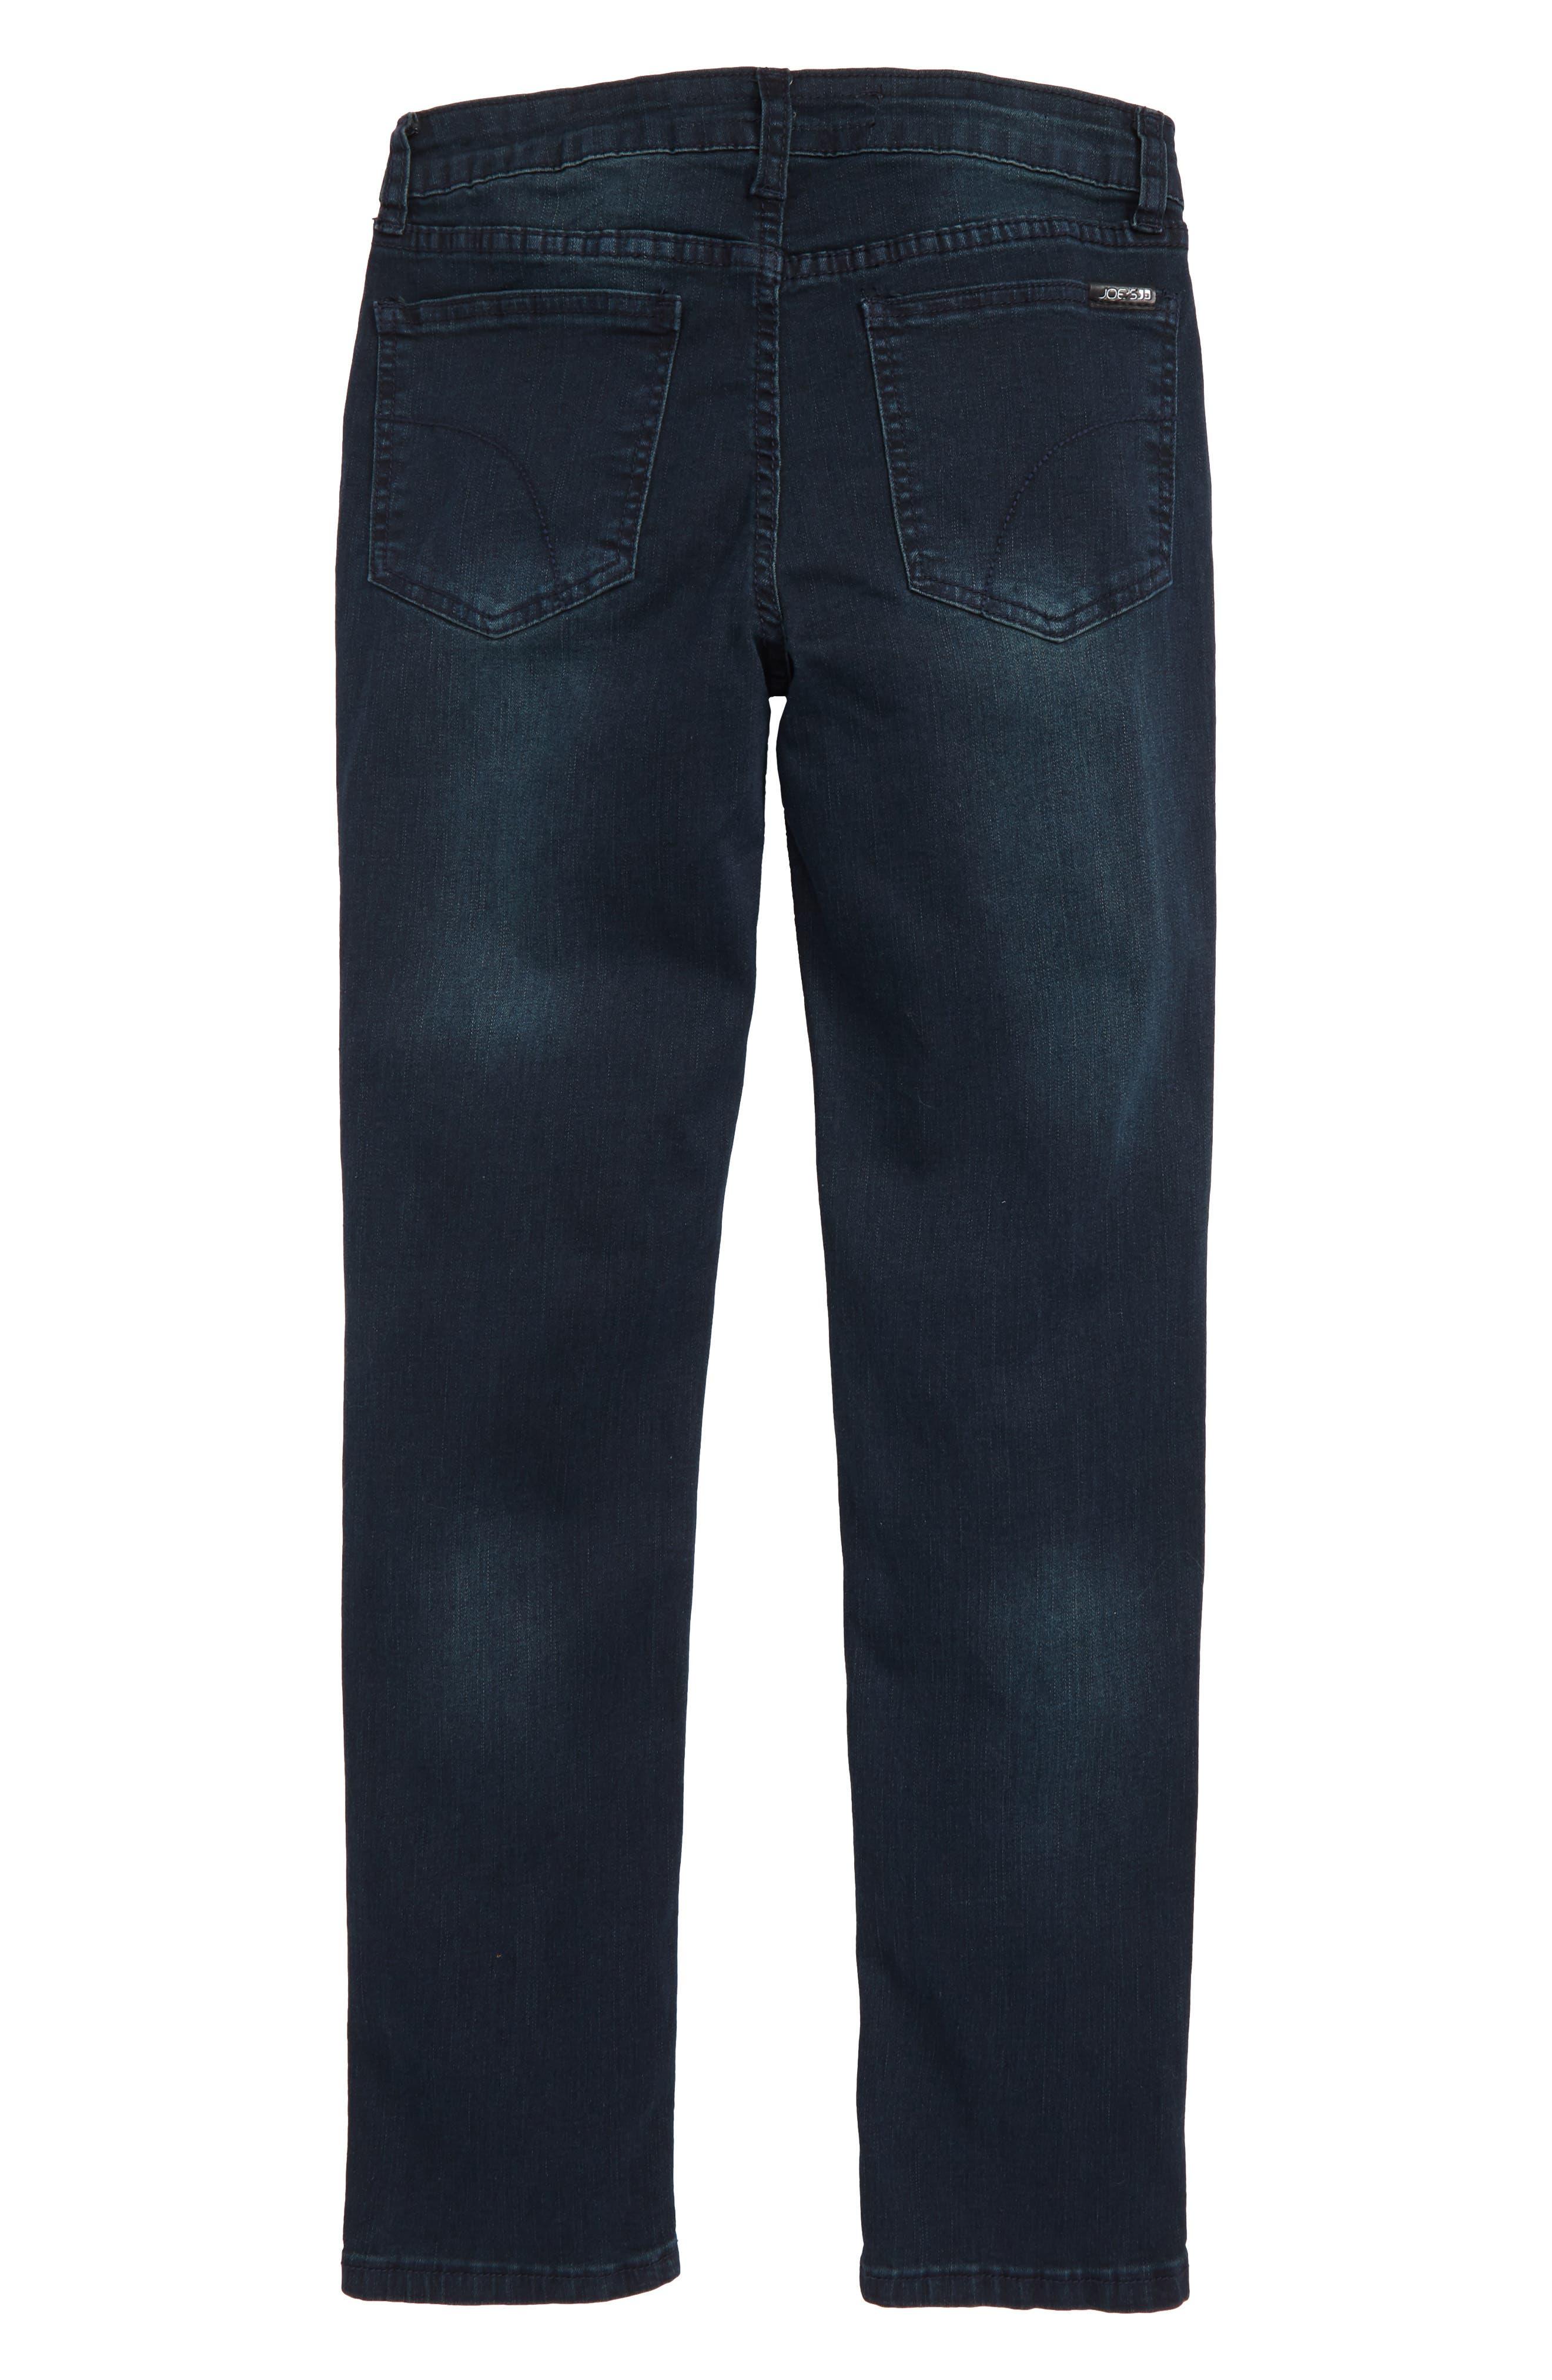 Rad Kinetic Stretch Skinny Jeans,                             Alternate thumbnail 2, color,                             020